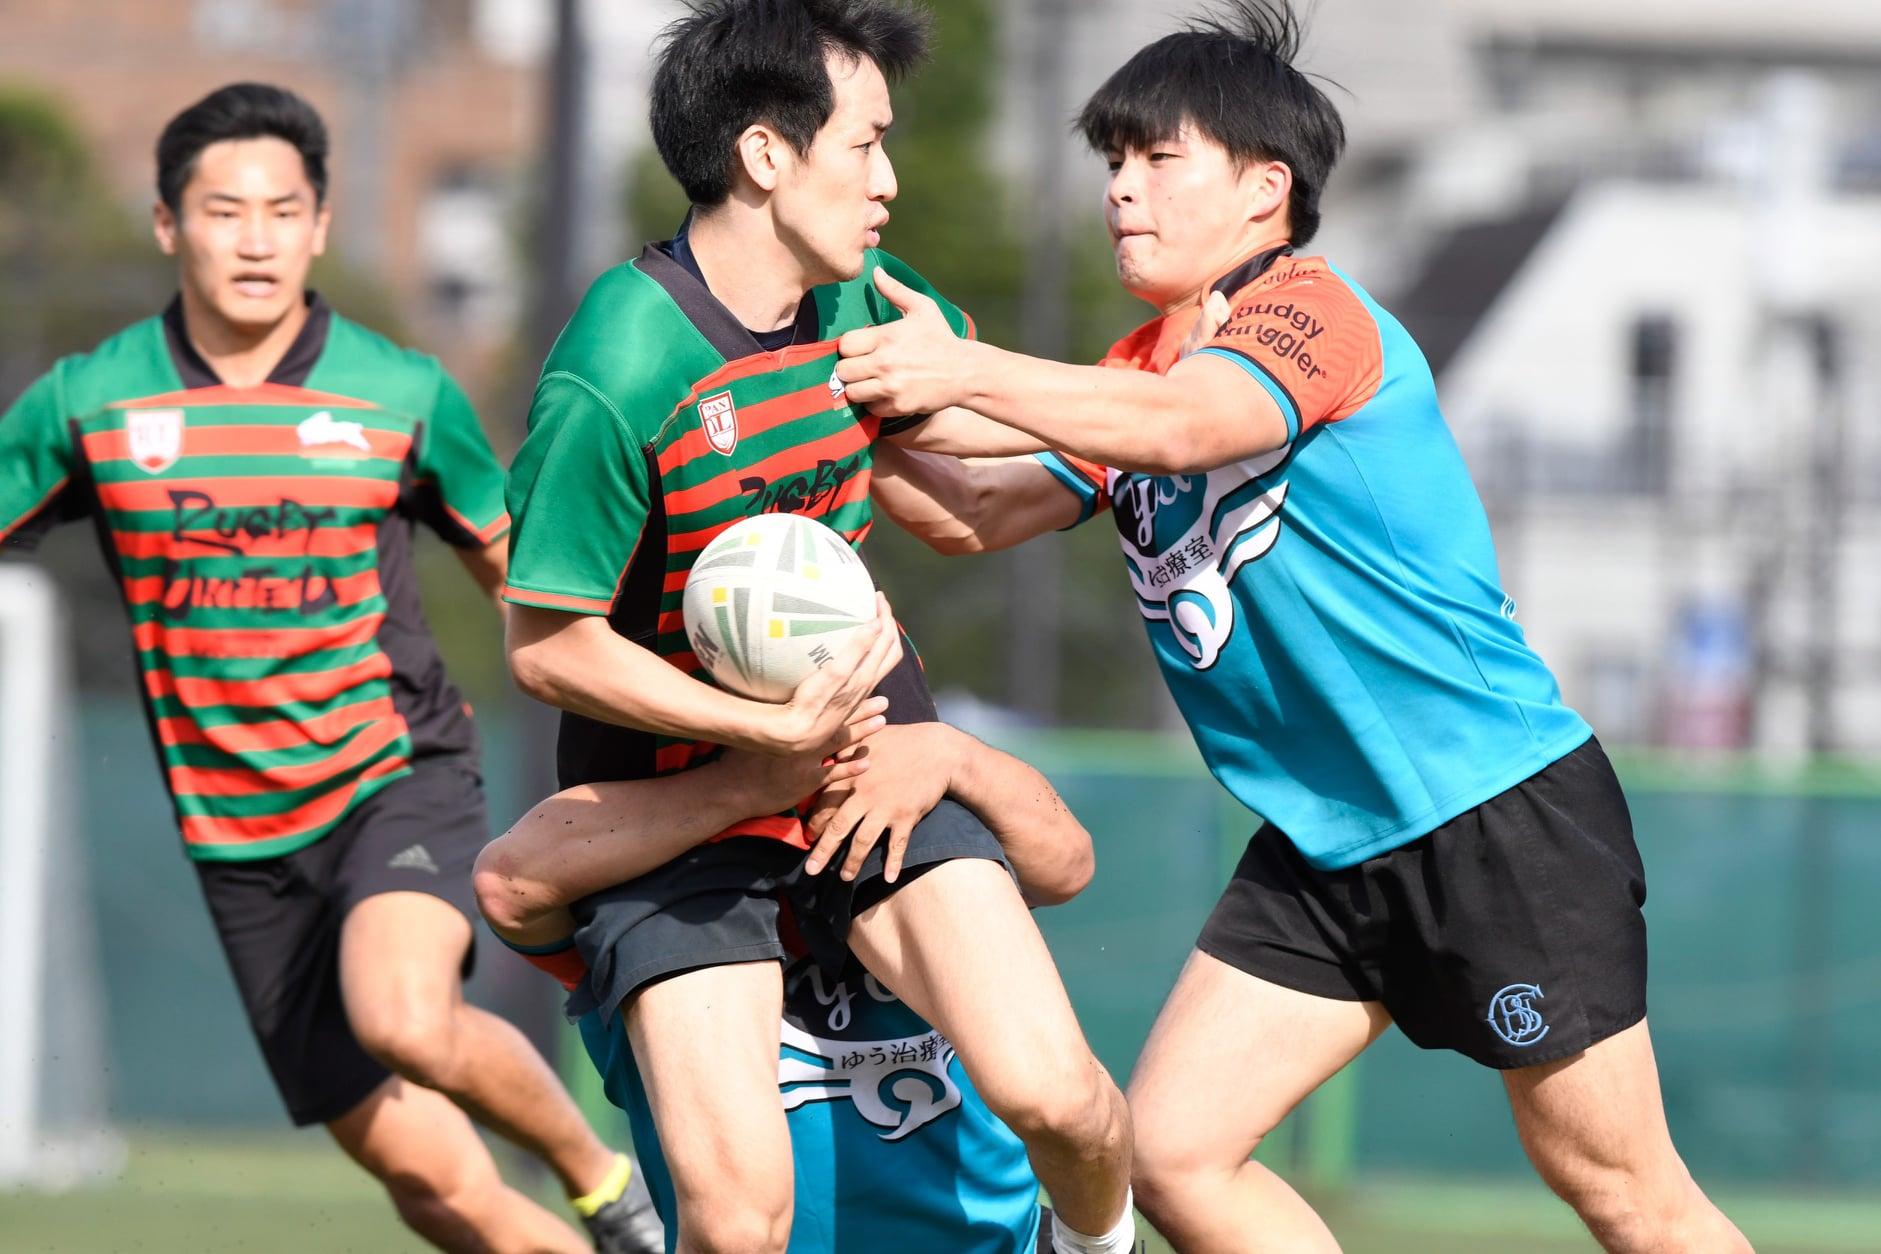 South Ikebukuro Rabbitohs defeat Abiko Ducks in Japanese National Cup